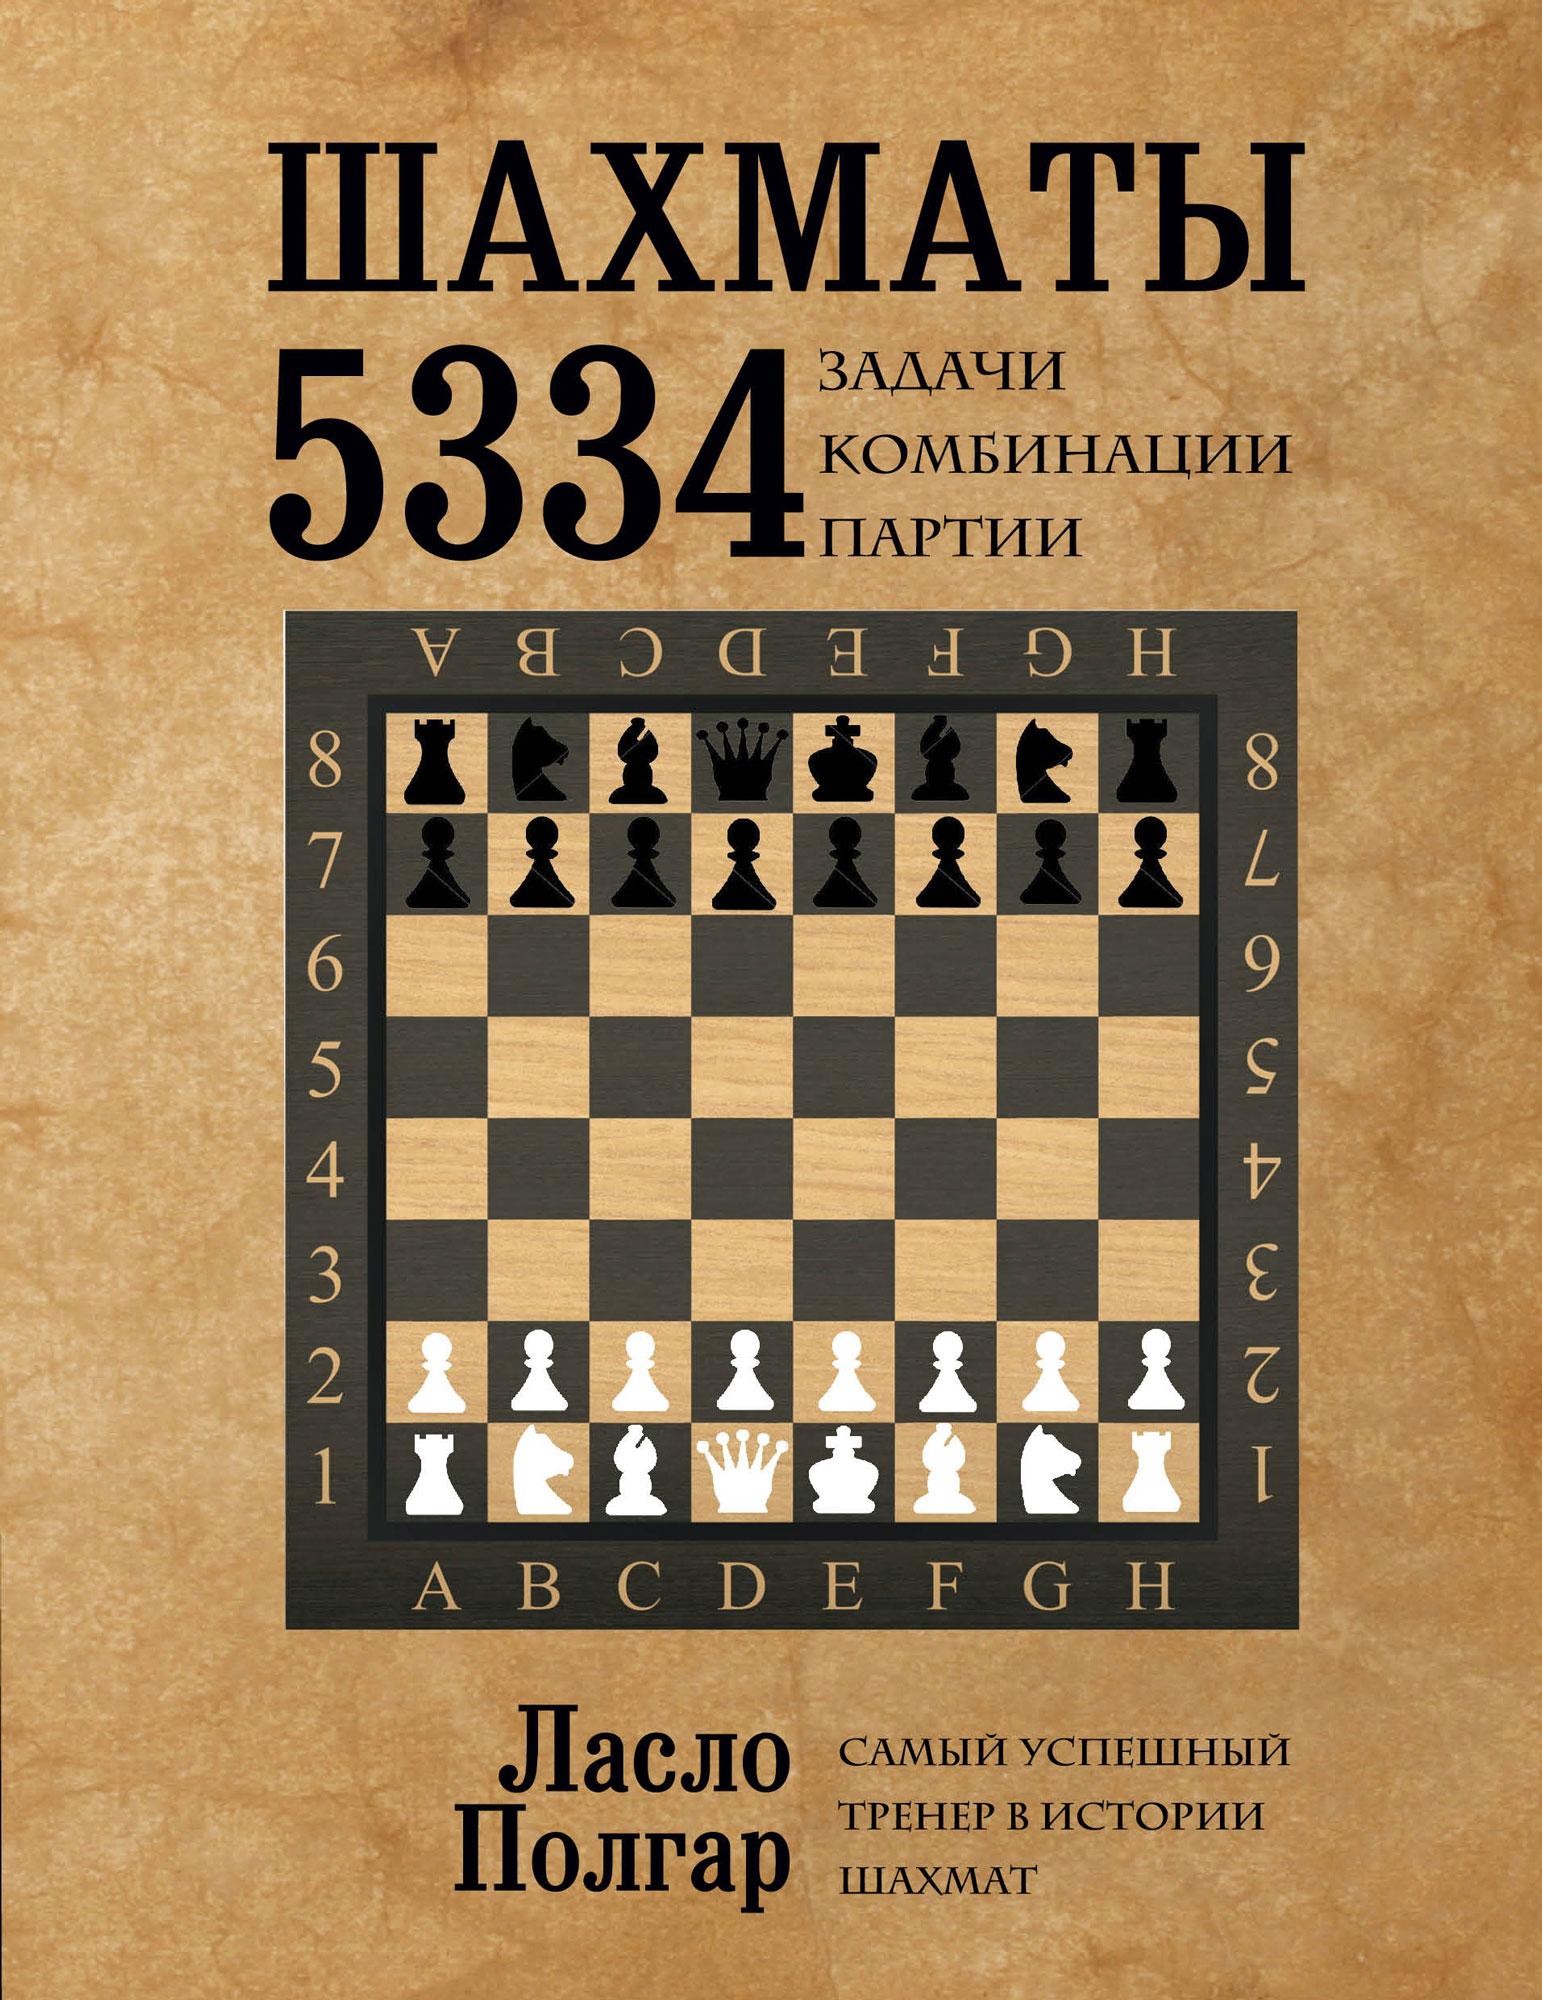 Шахматы. 5334 задачи, комбинации и партии. Ласло Полгар